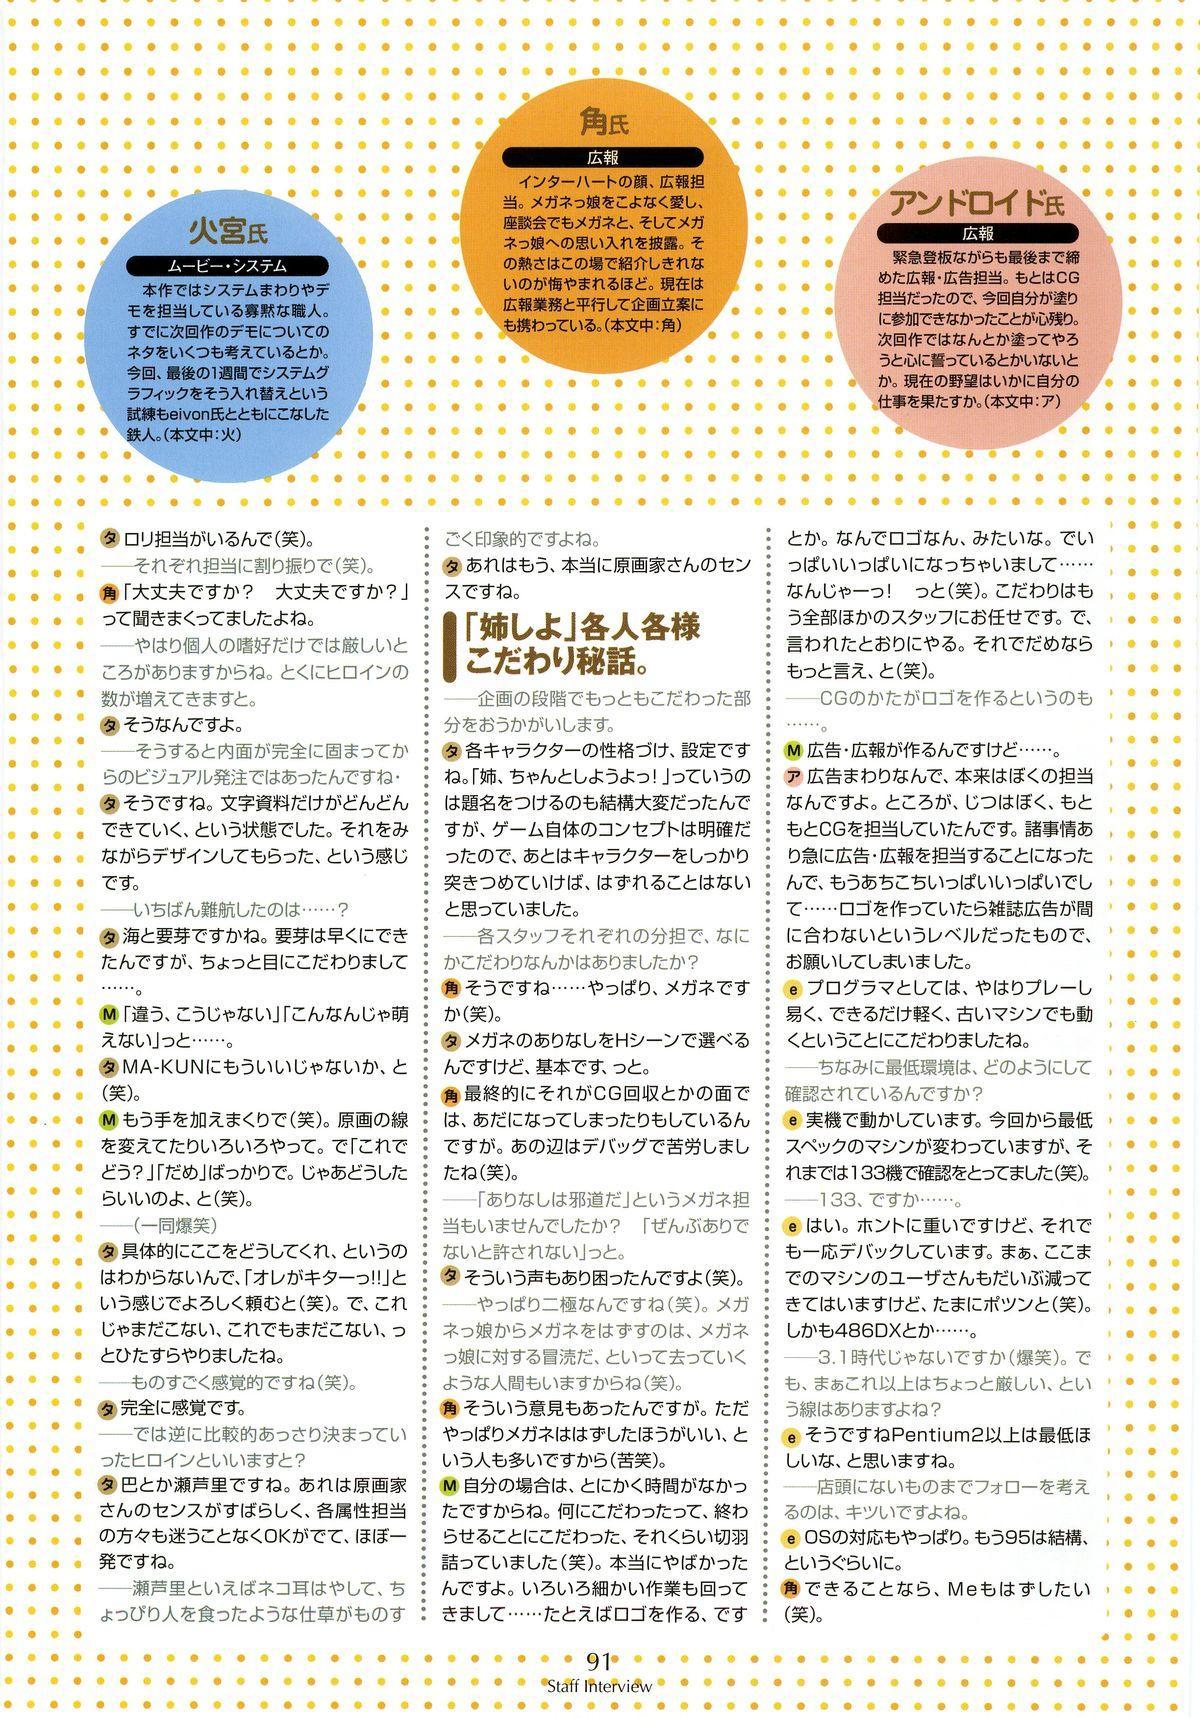 Nee, Chan to Shiyou yo! Koushiki Fanbook - Ai to Batou no Hibi 82